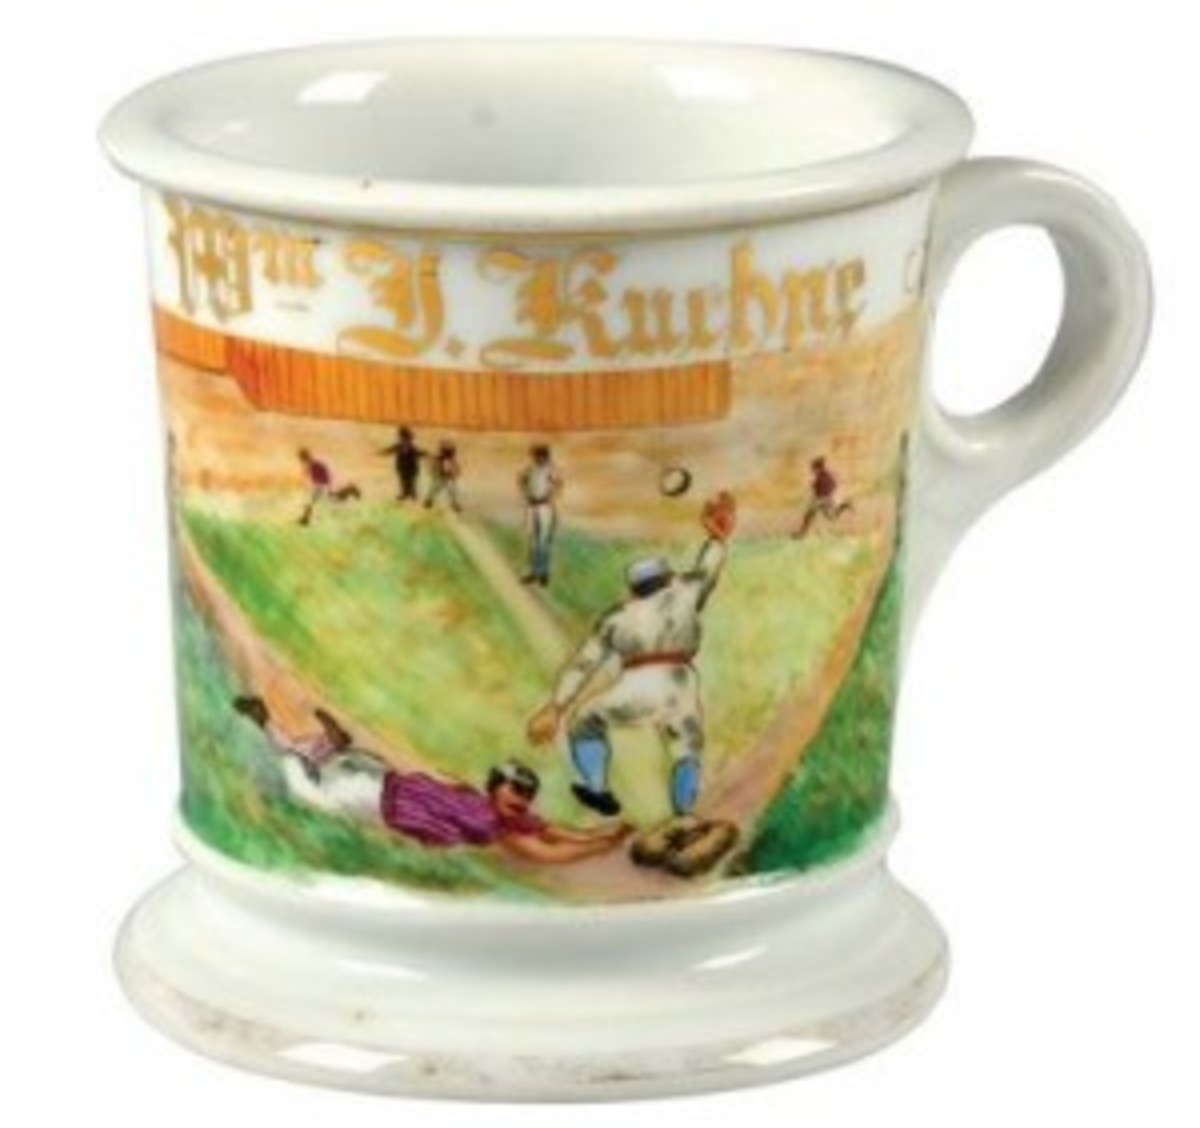 Kuehne-baseball-shaving-mug-small-300x282